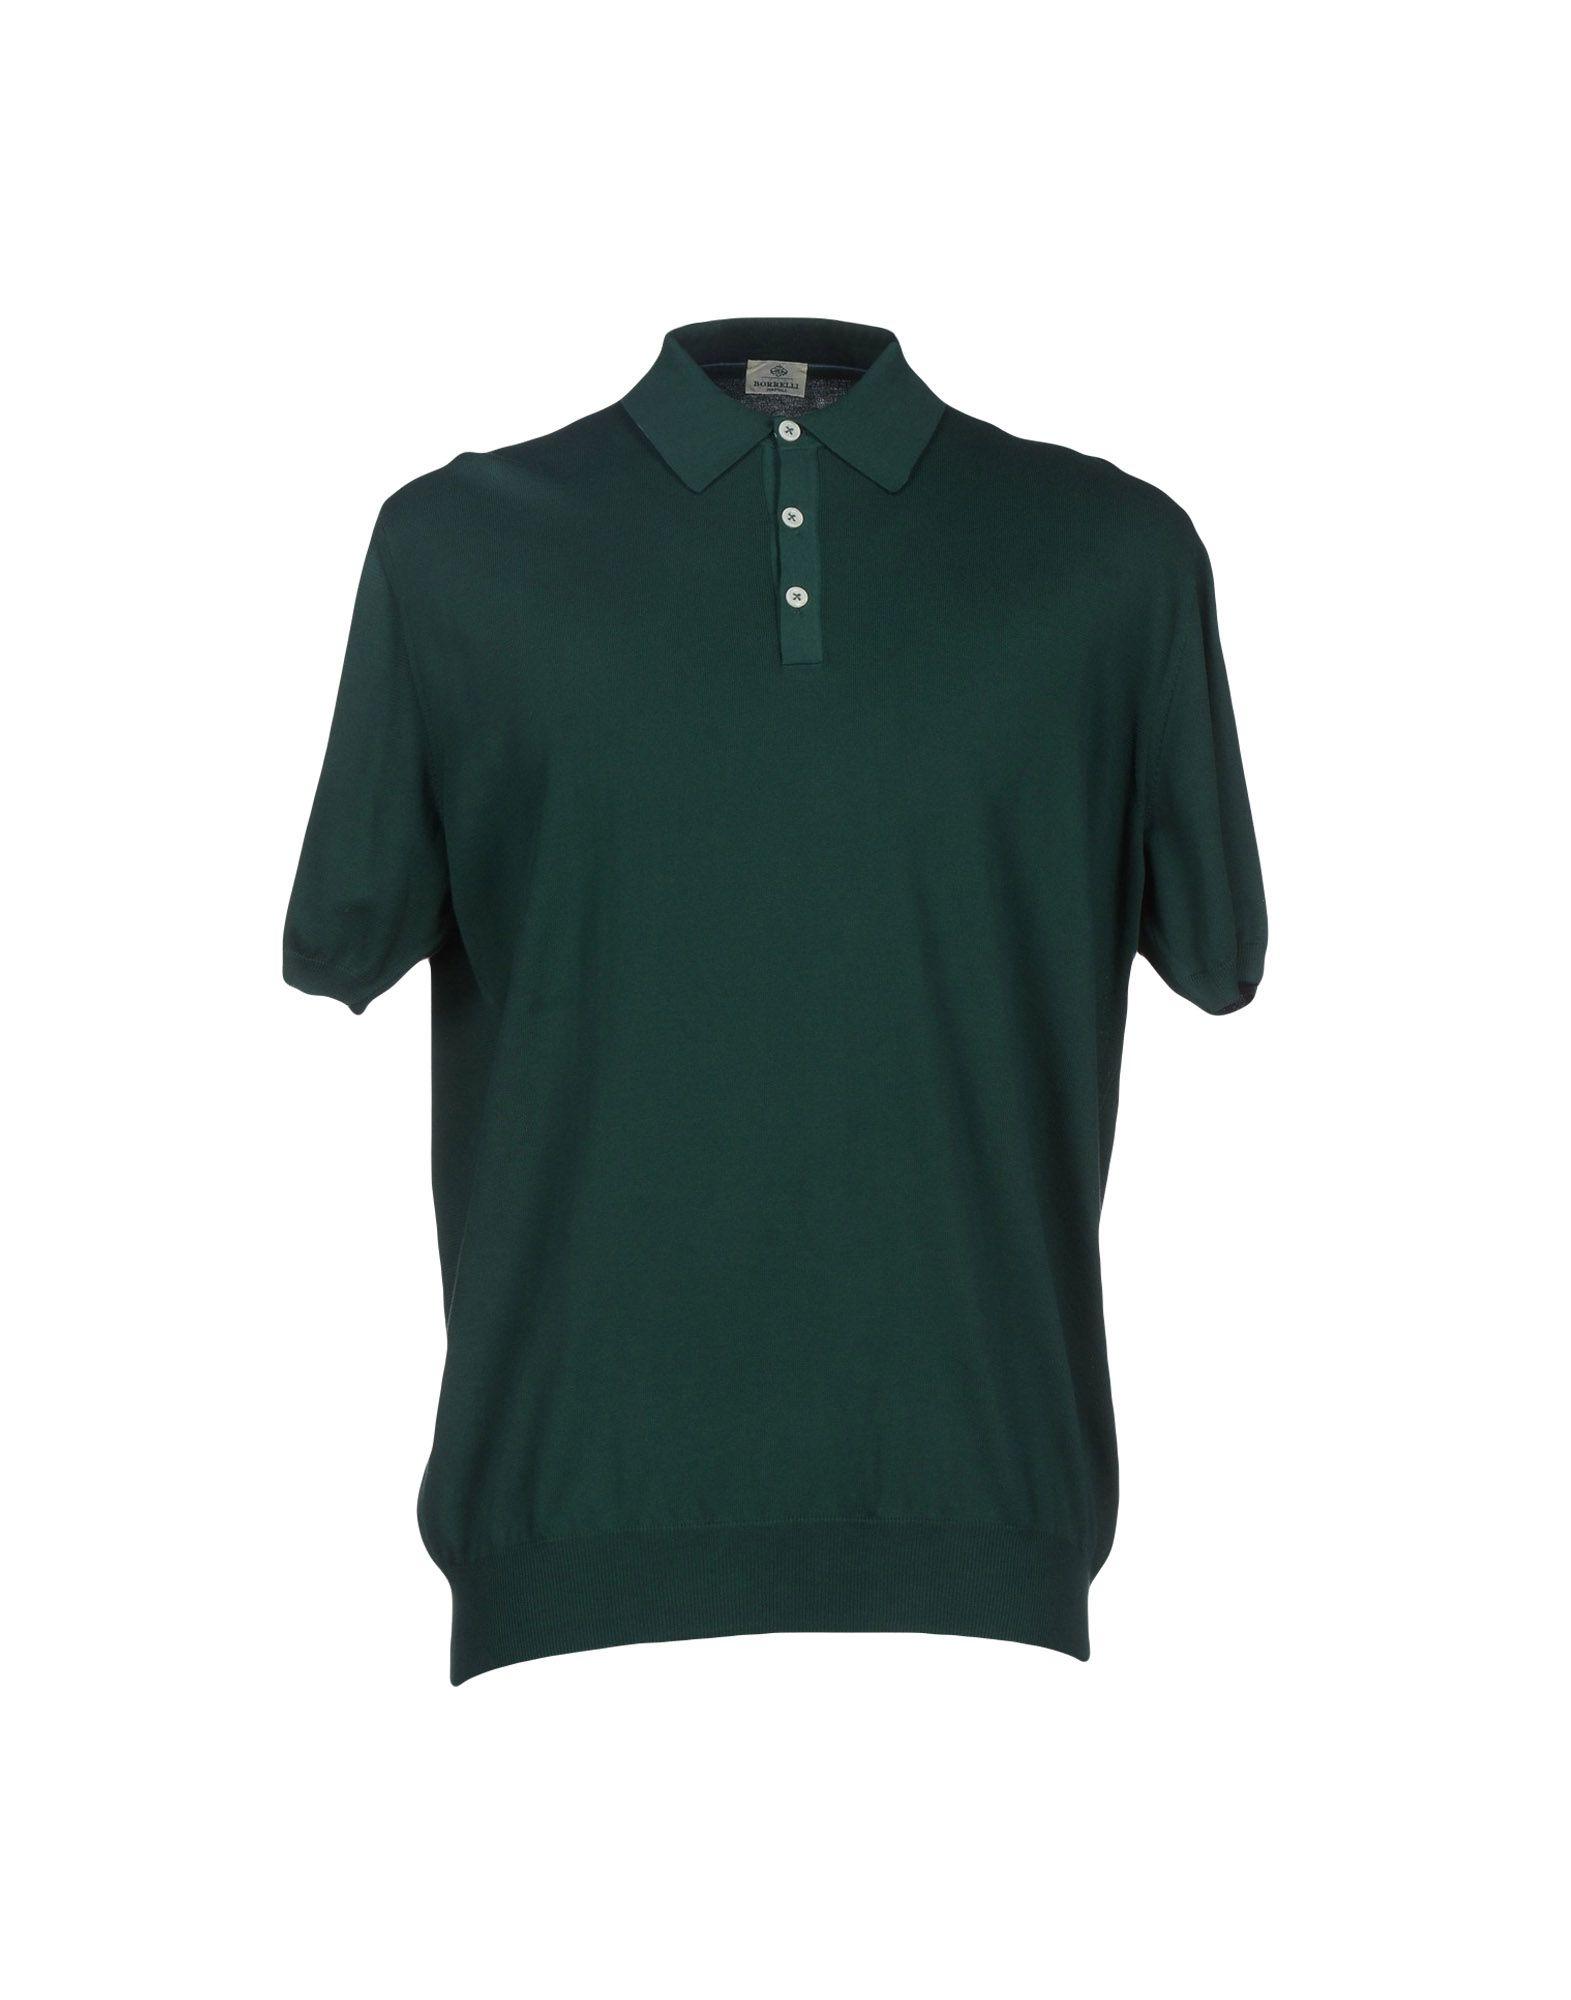 Luigi borrelli napoli polo shirt in green for men dark for Dark green mens polo shirt